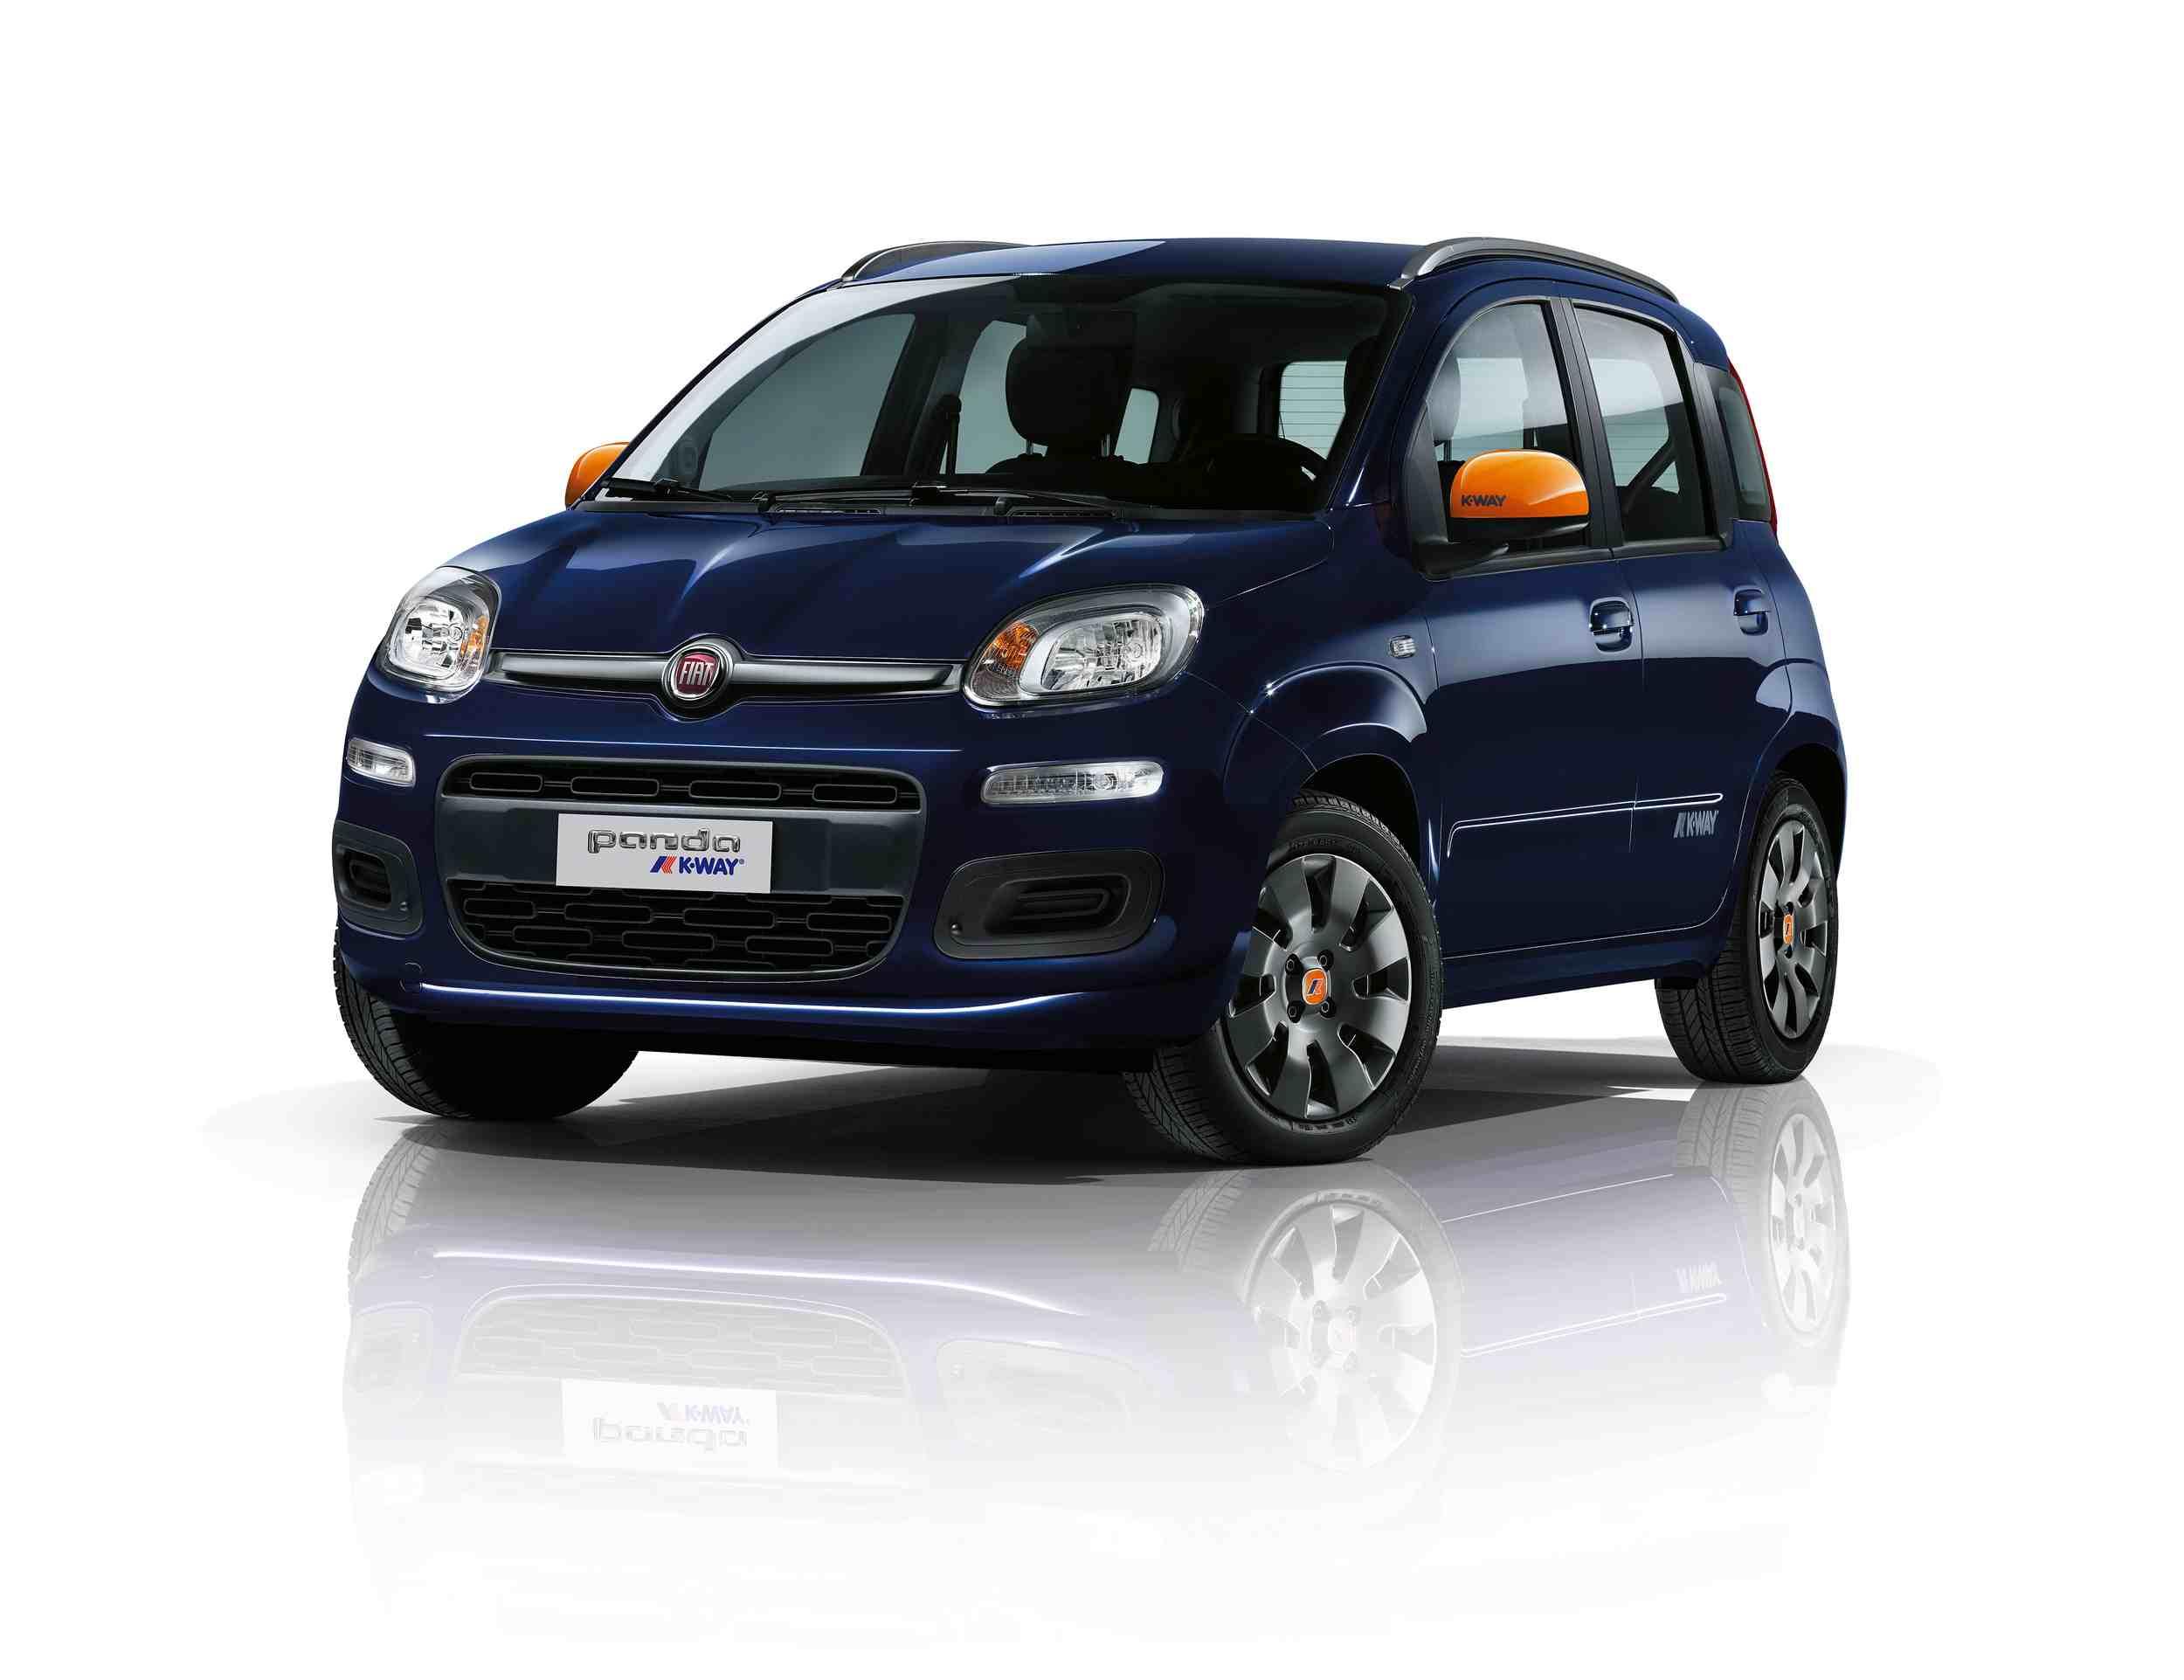 Fiat Panda K-Way 2015 01